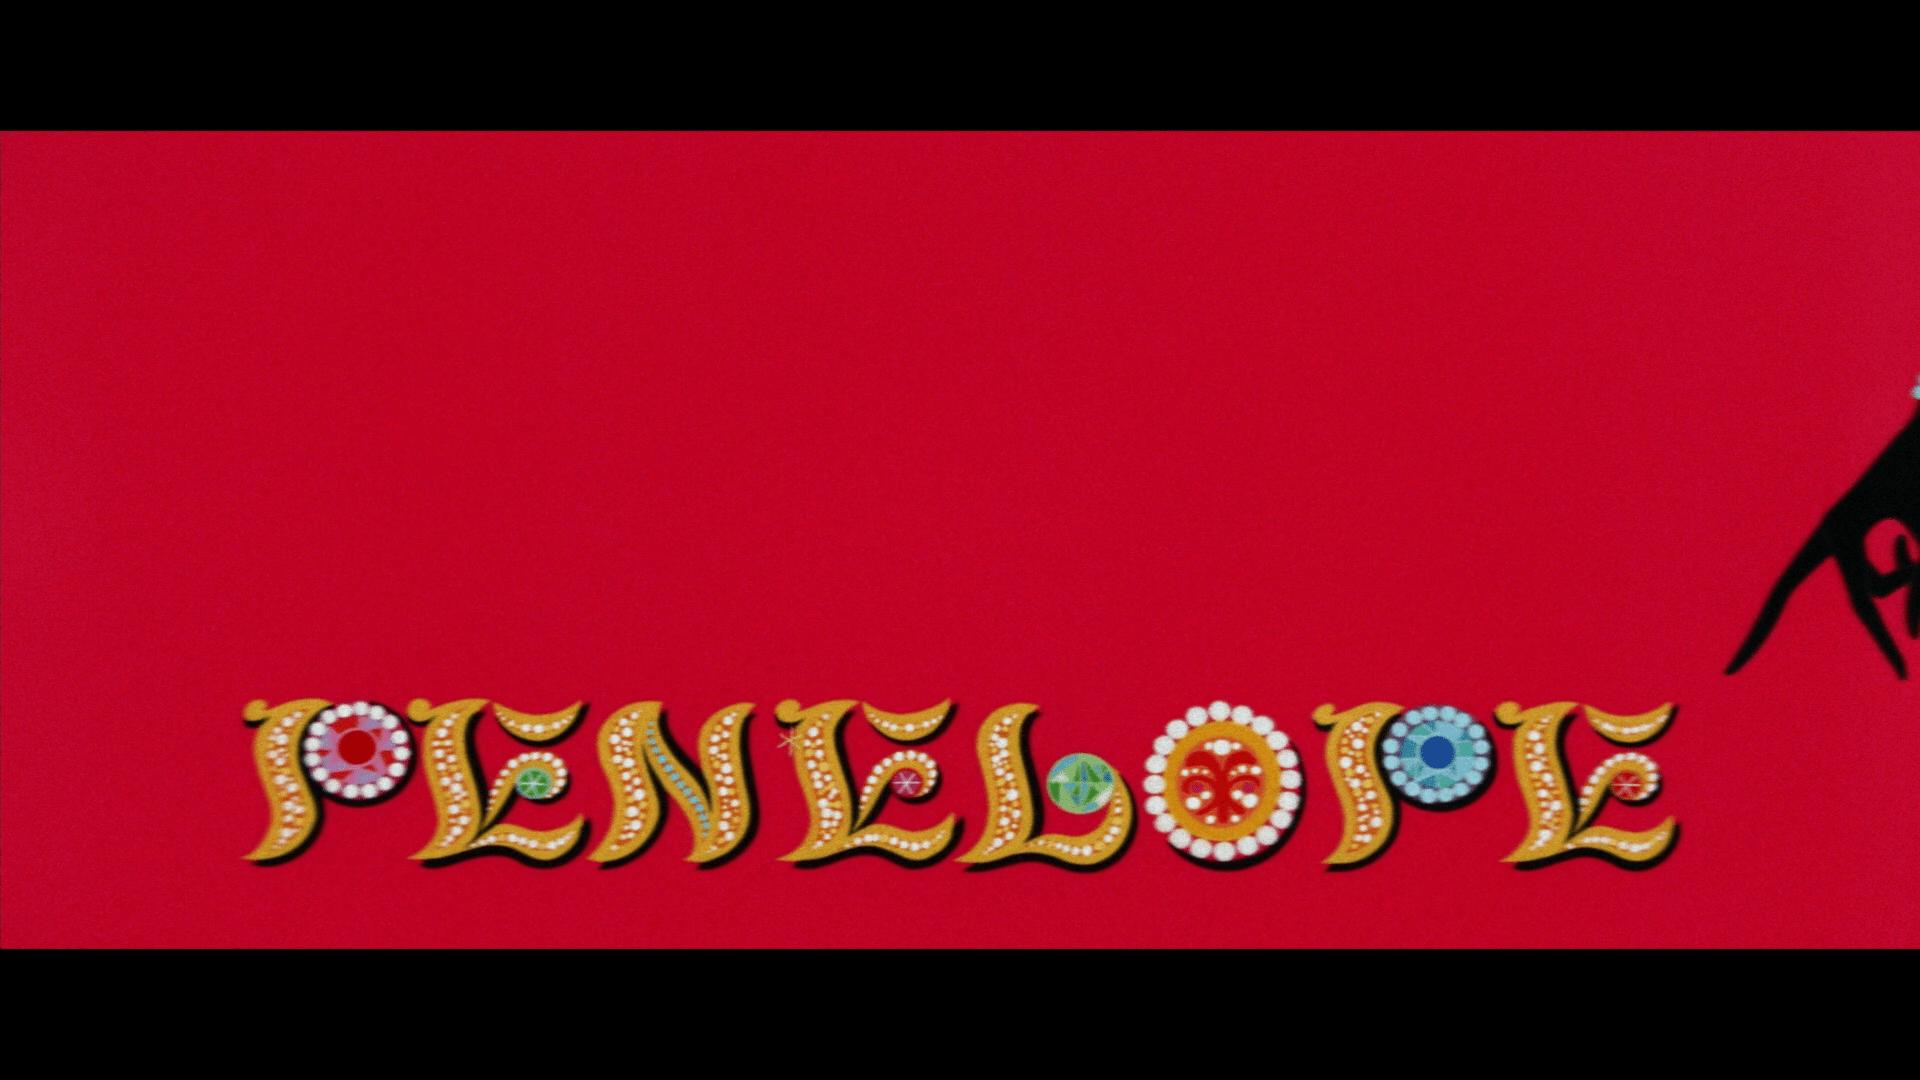 Penelope Warner Archive Blu-ray title